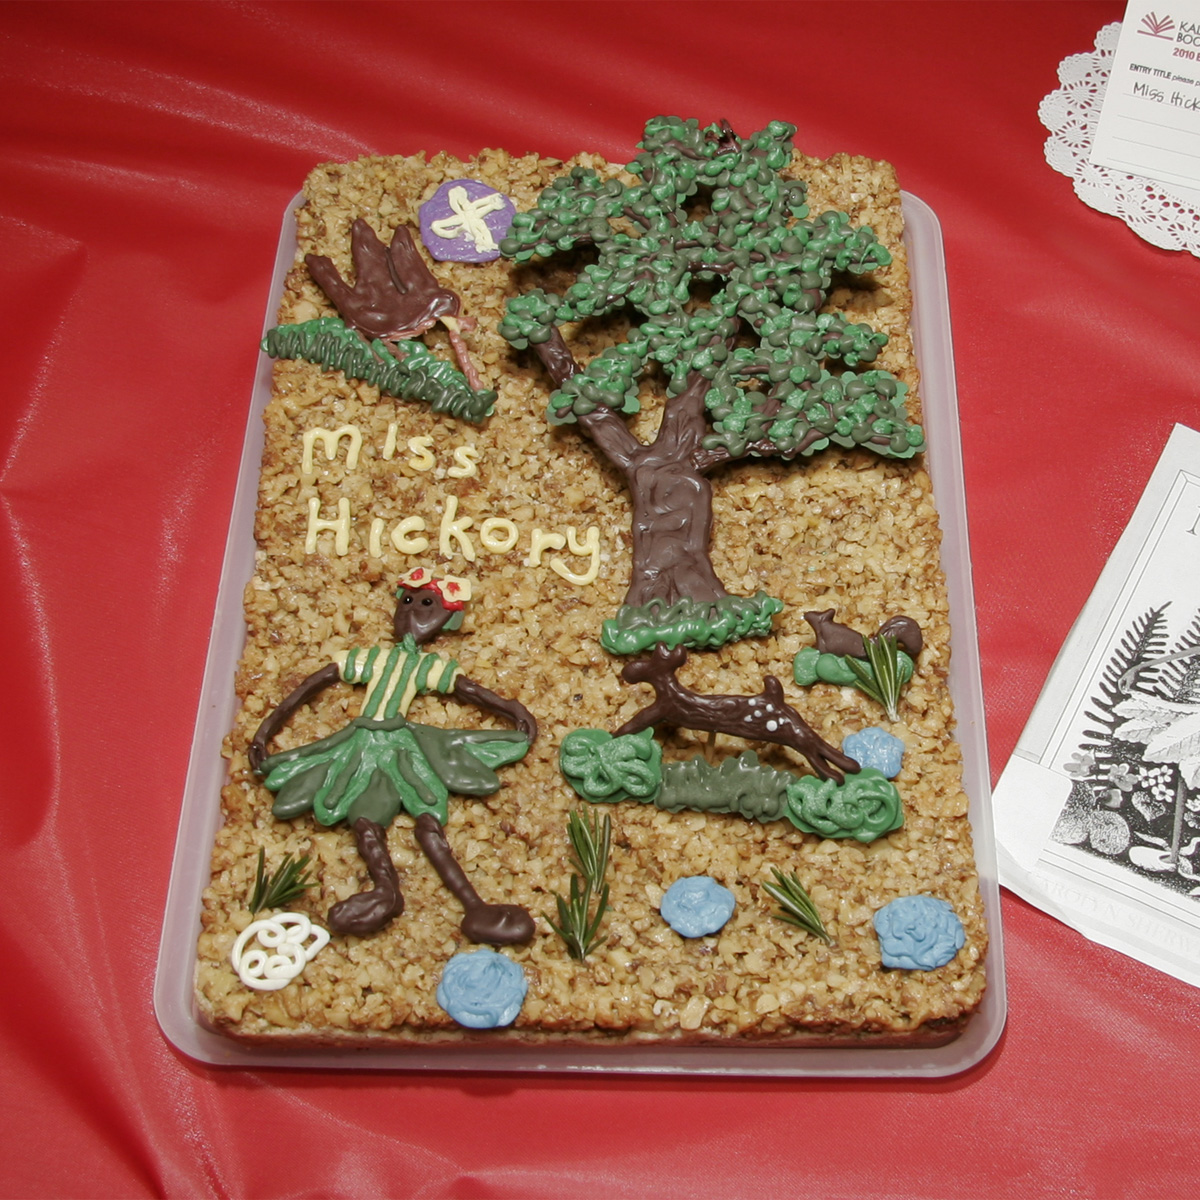 """Miss Hickory"" created by Sara Keller, 2010 KBAC Edible Book Festival"